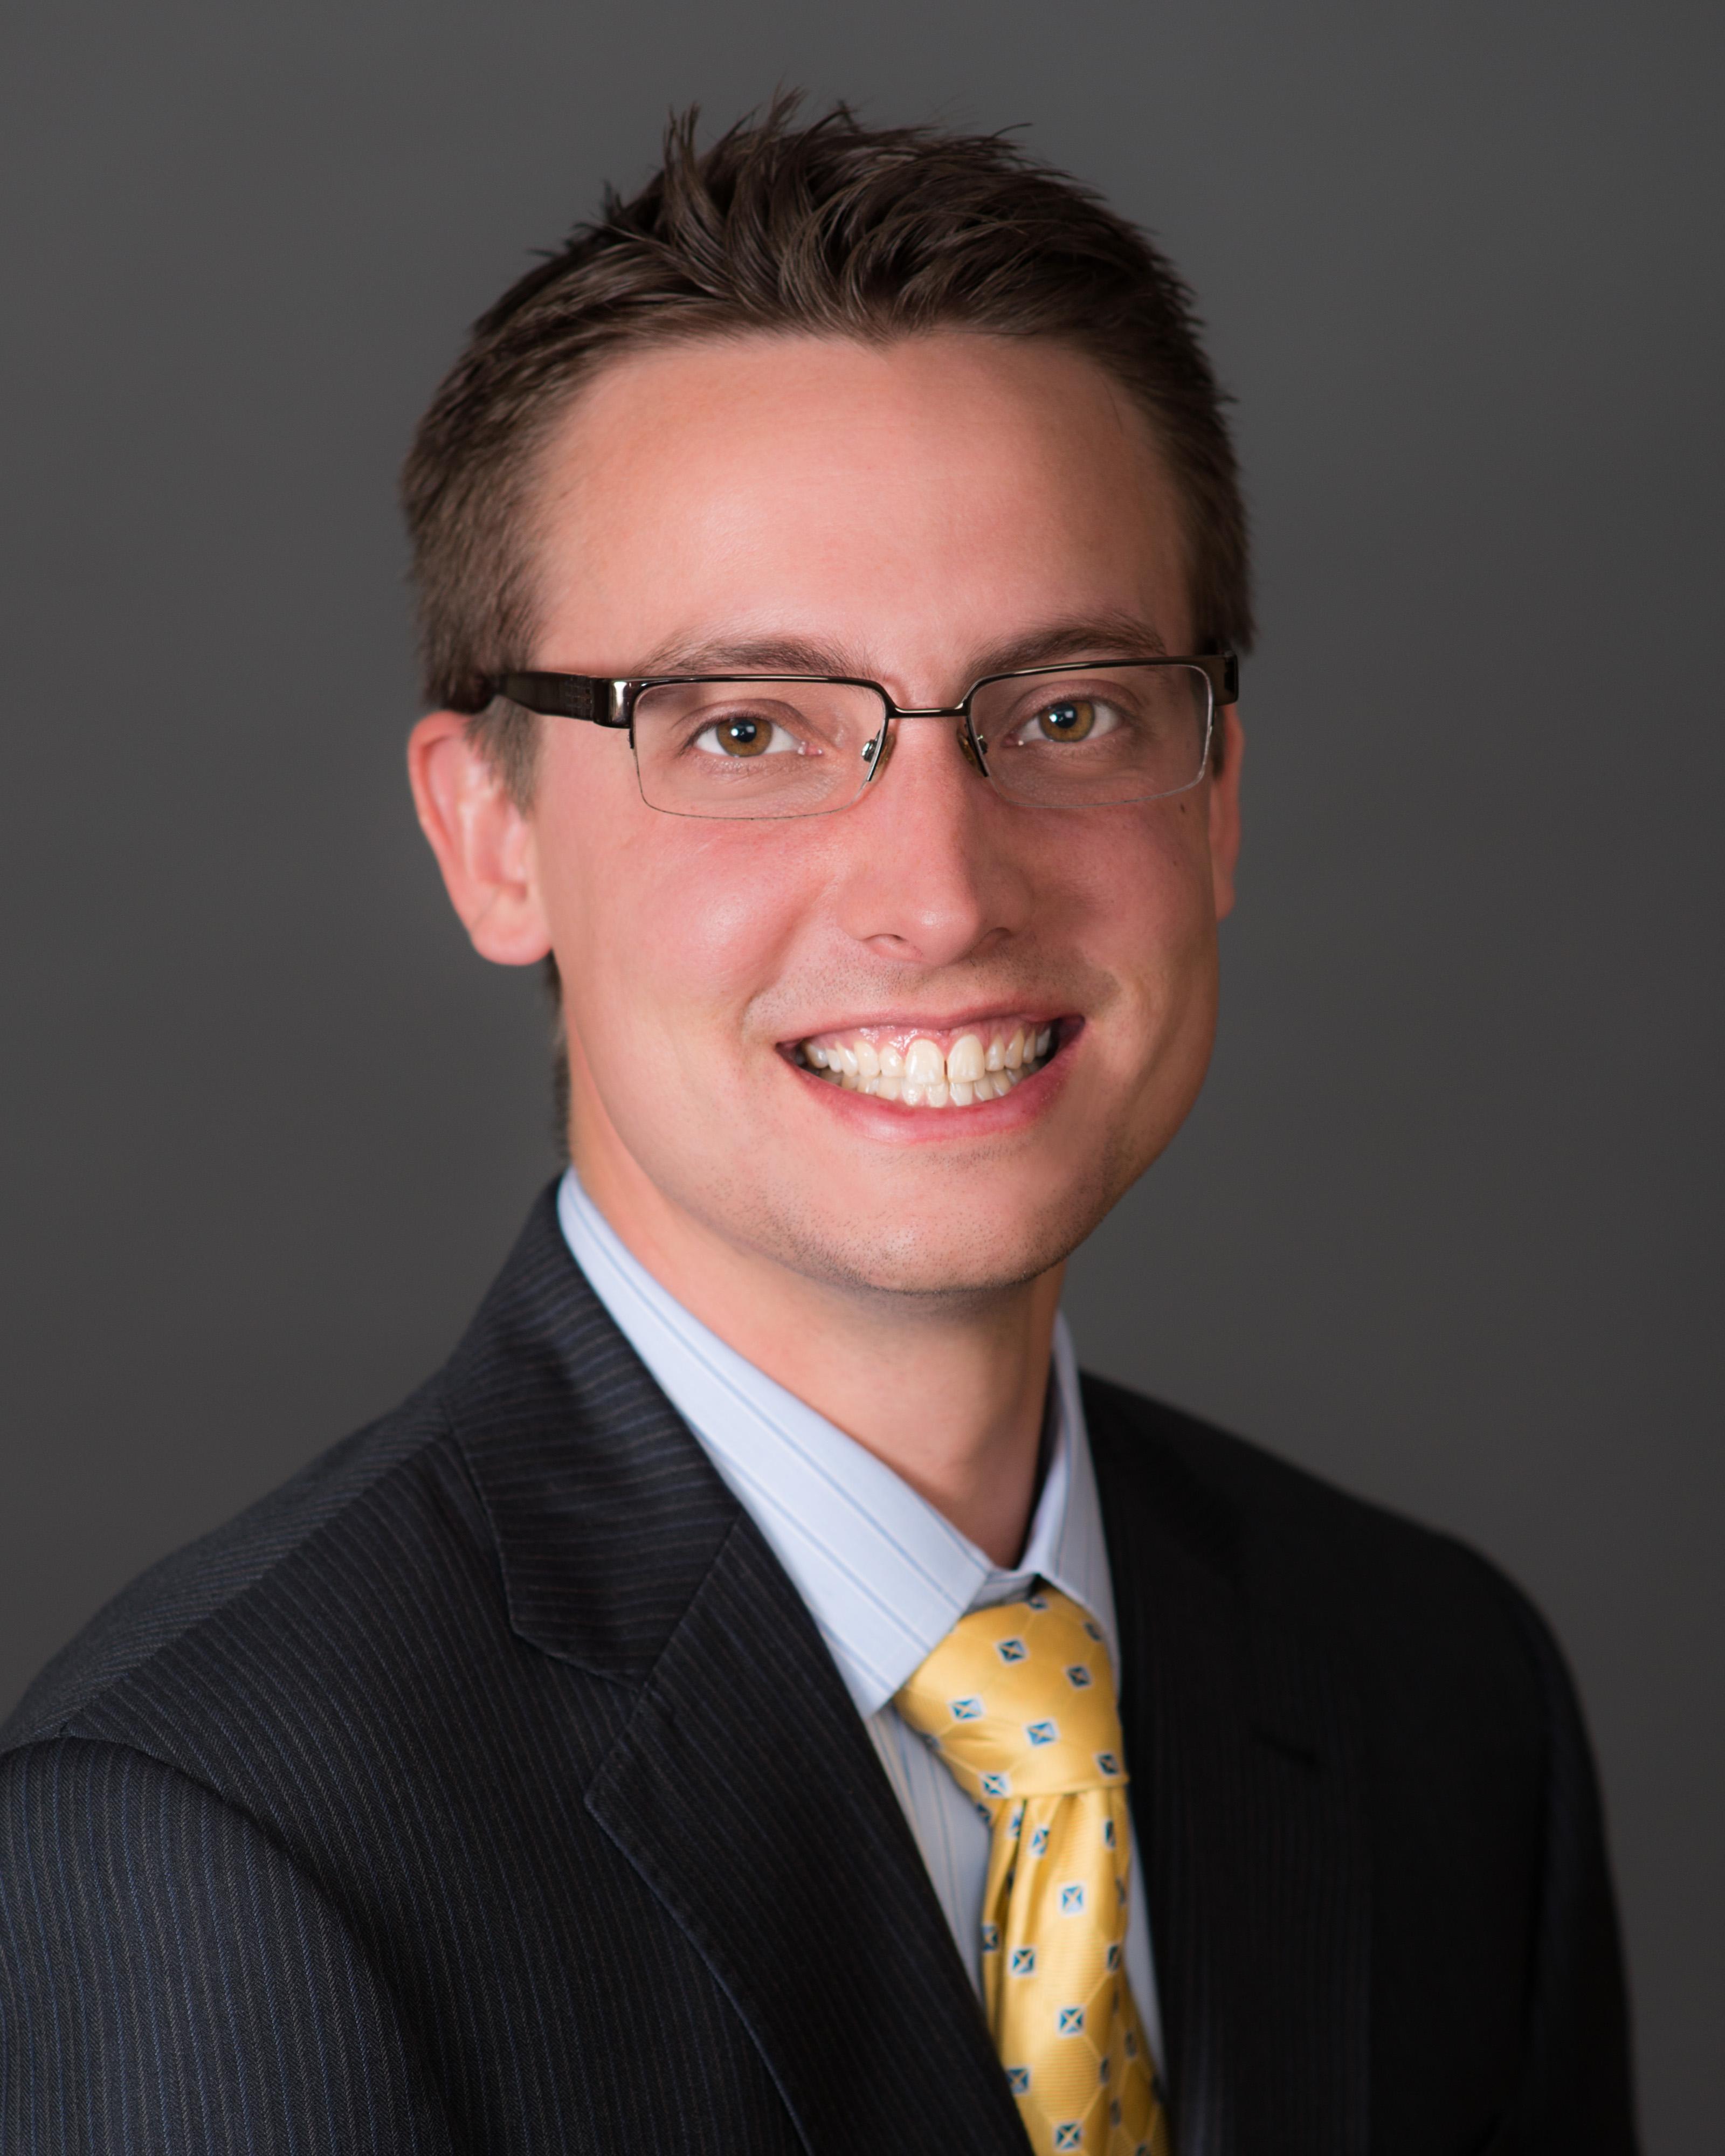 Anthony Sannazzaro, Co-Founder of HIGHMARK